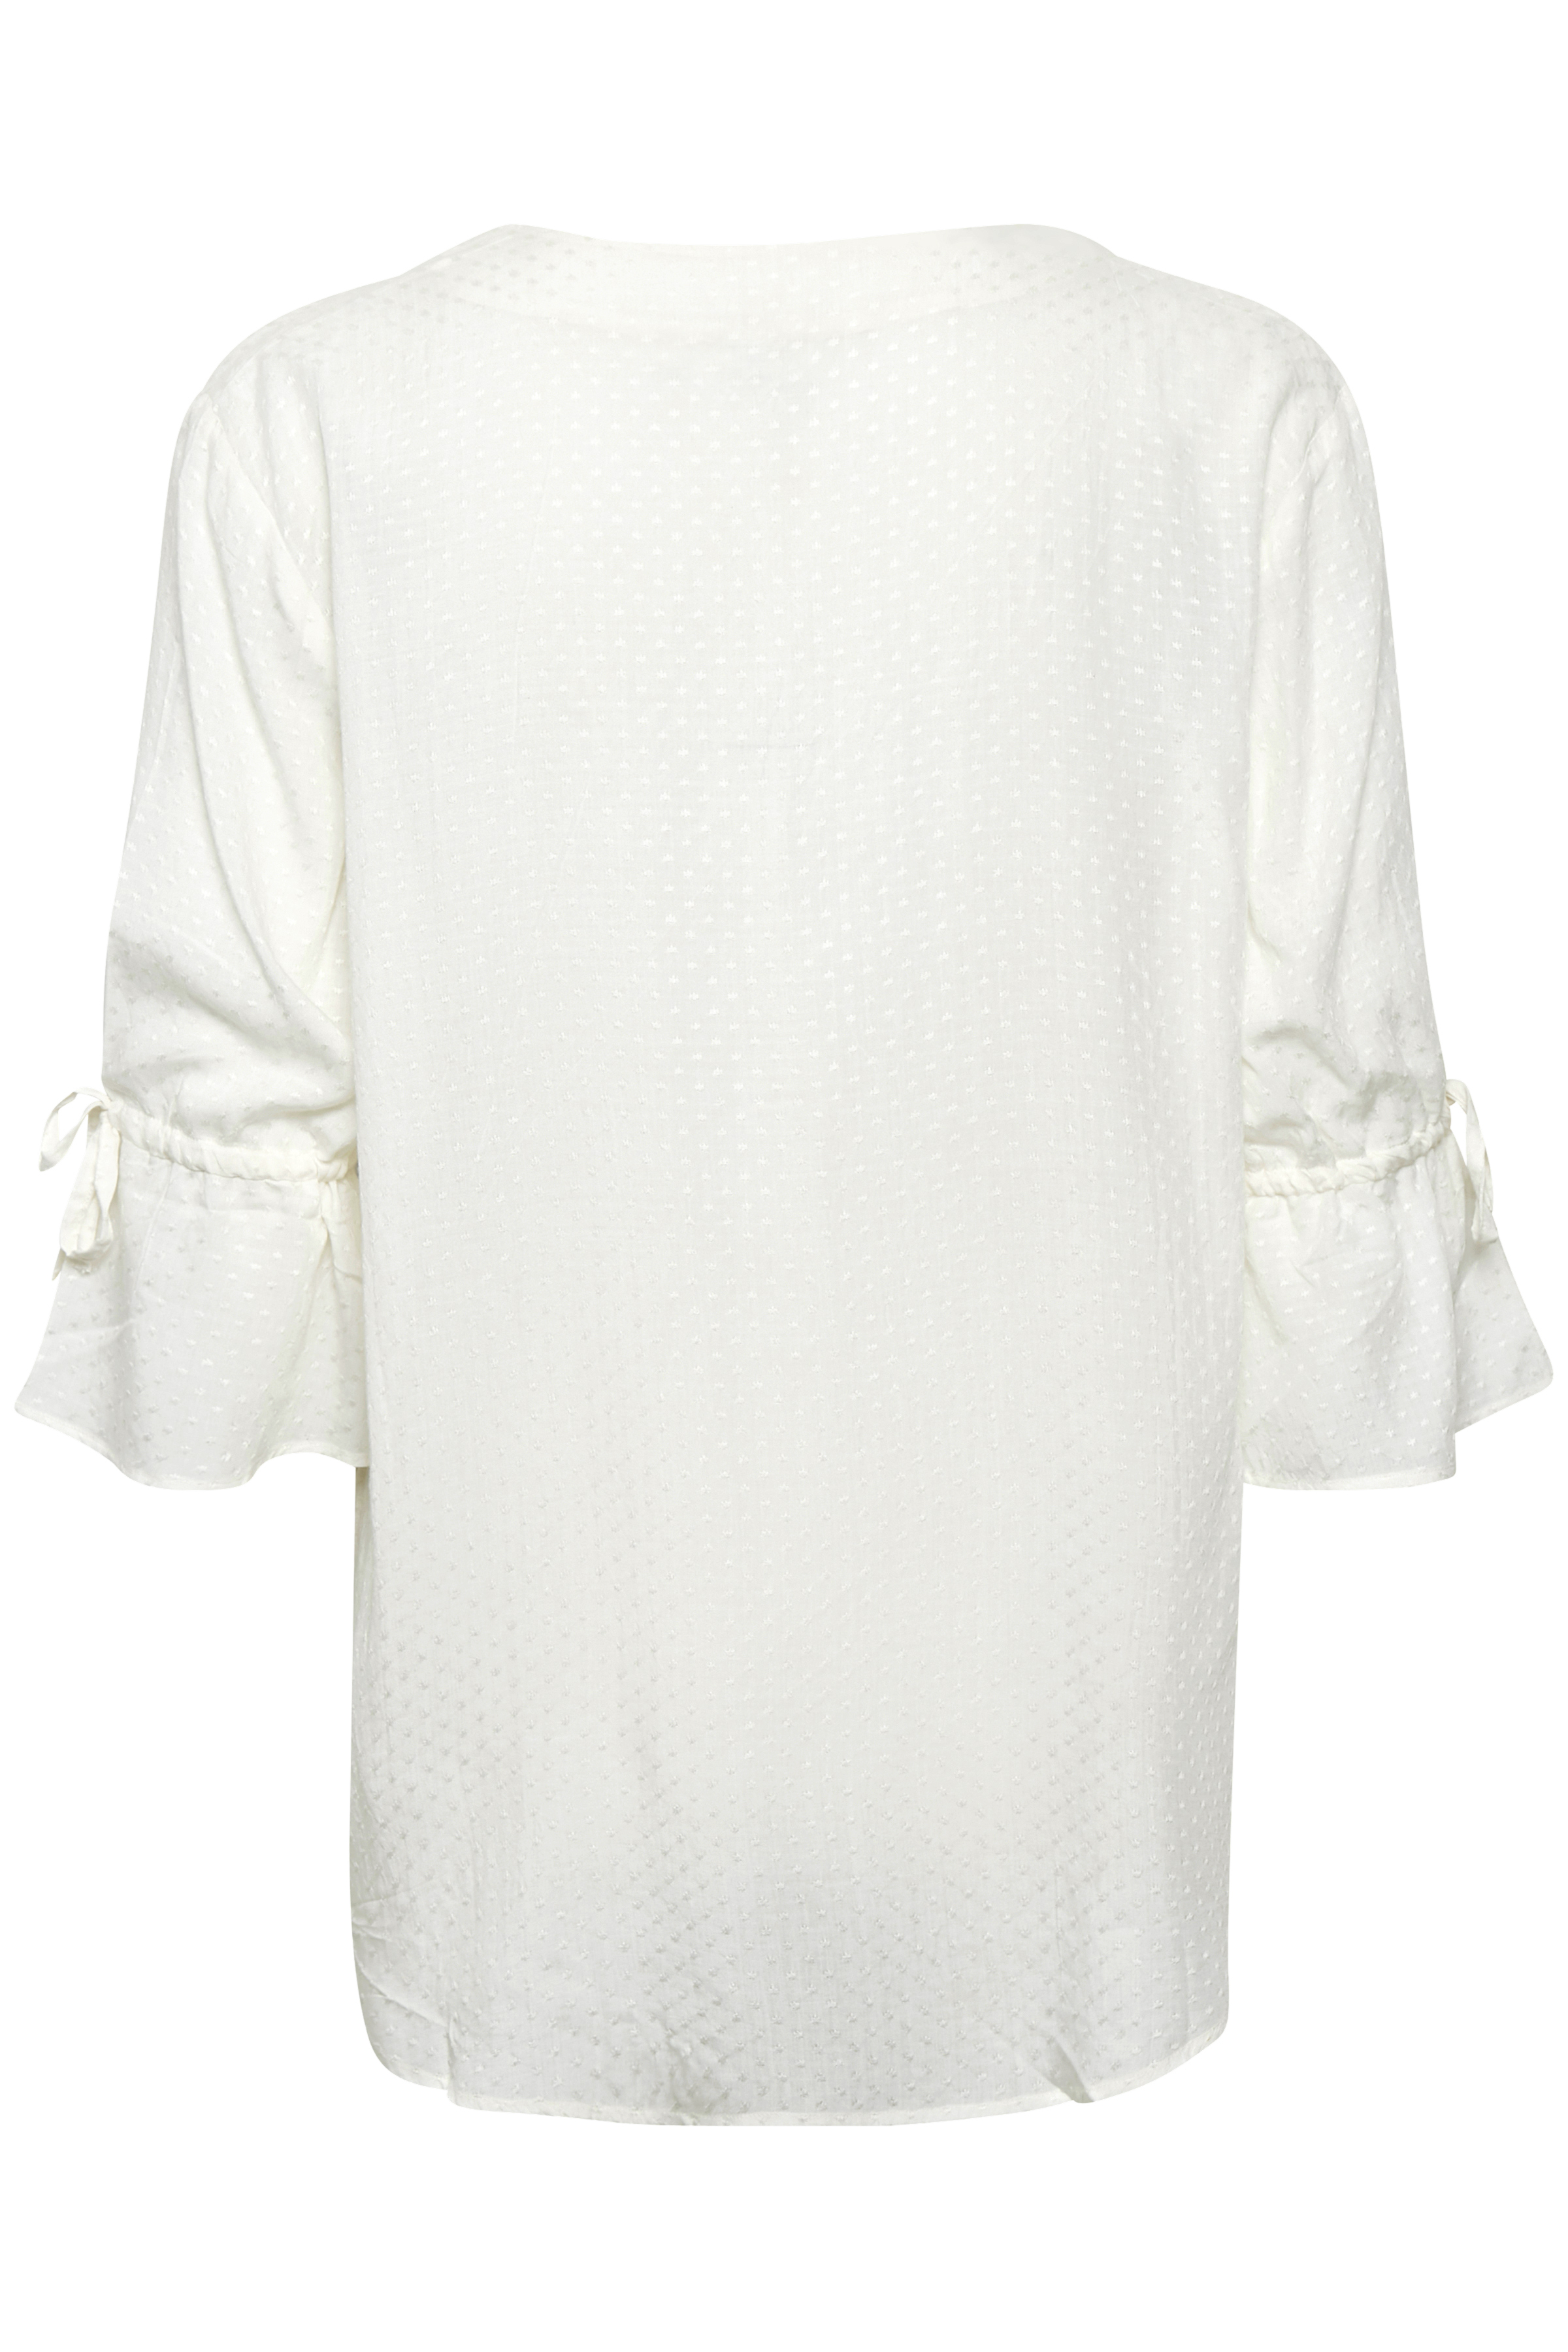 Off-white Blus  från Bon'A Parte – Köp Off-white Blus  från stl. S-2XL här